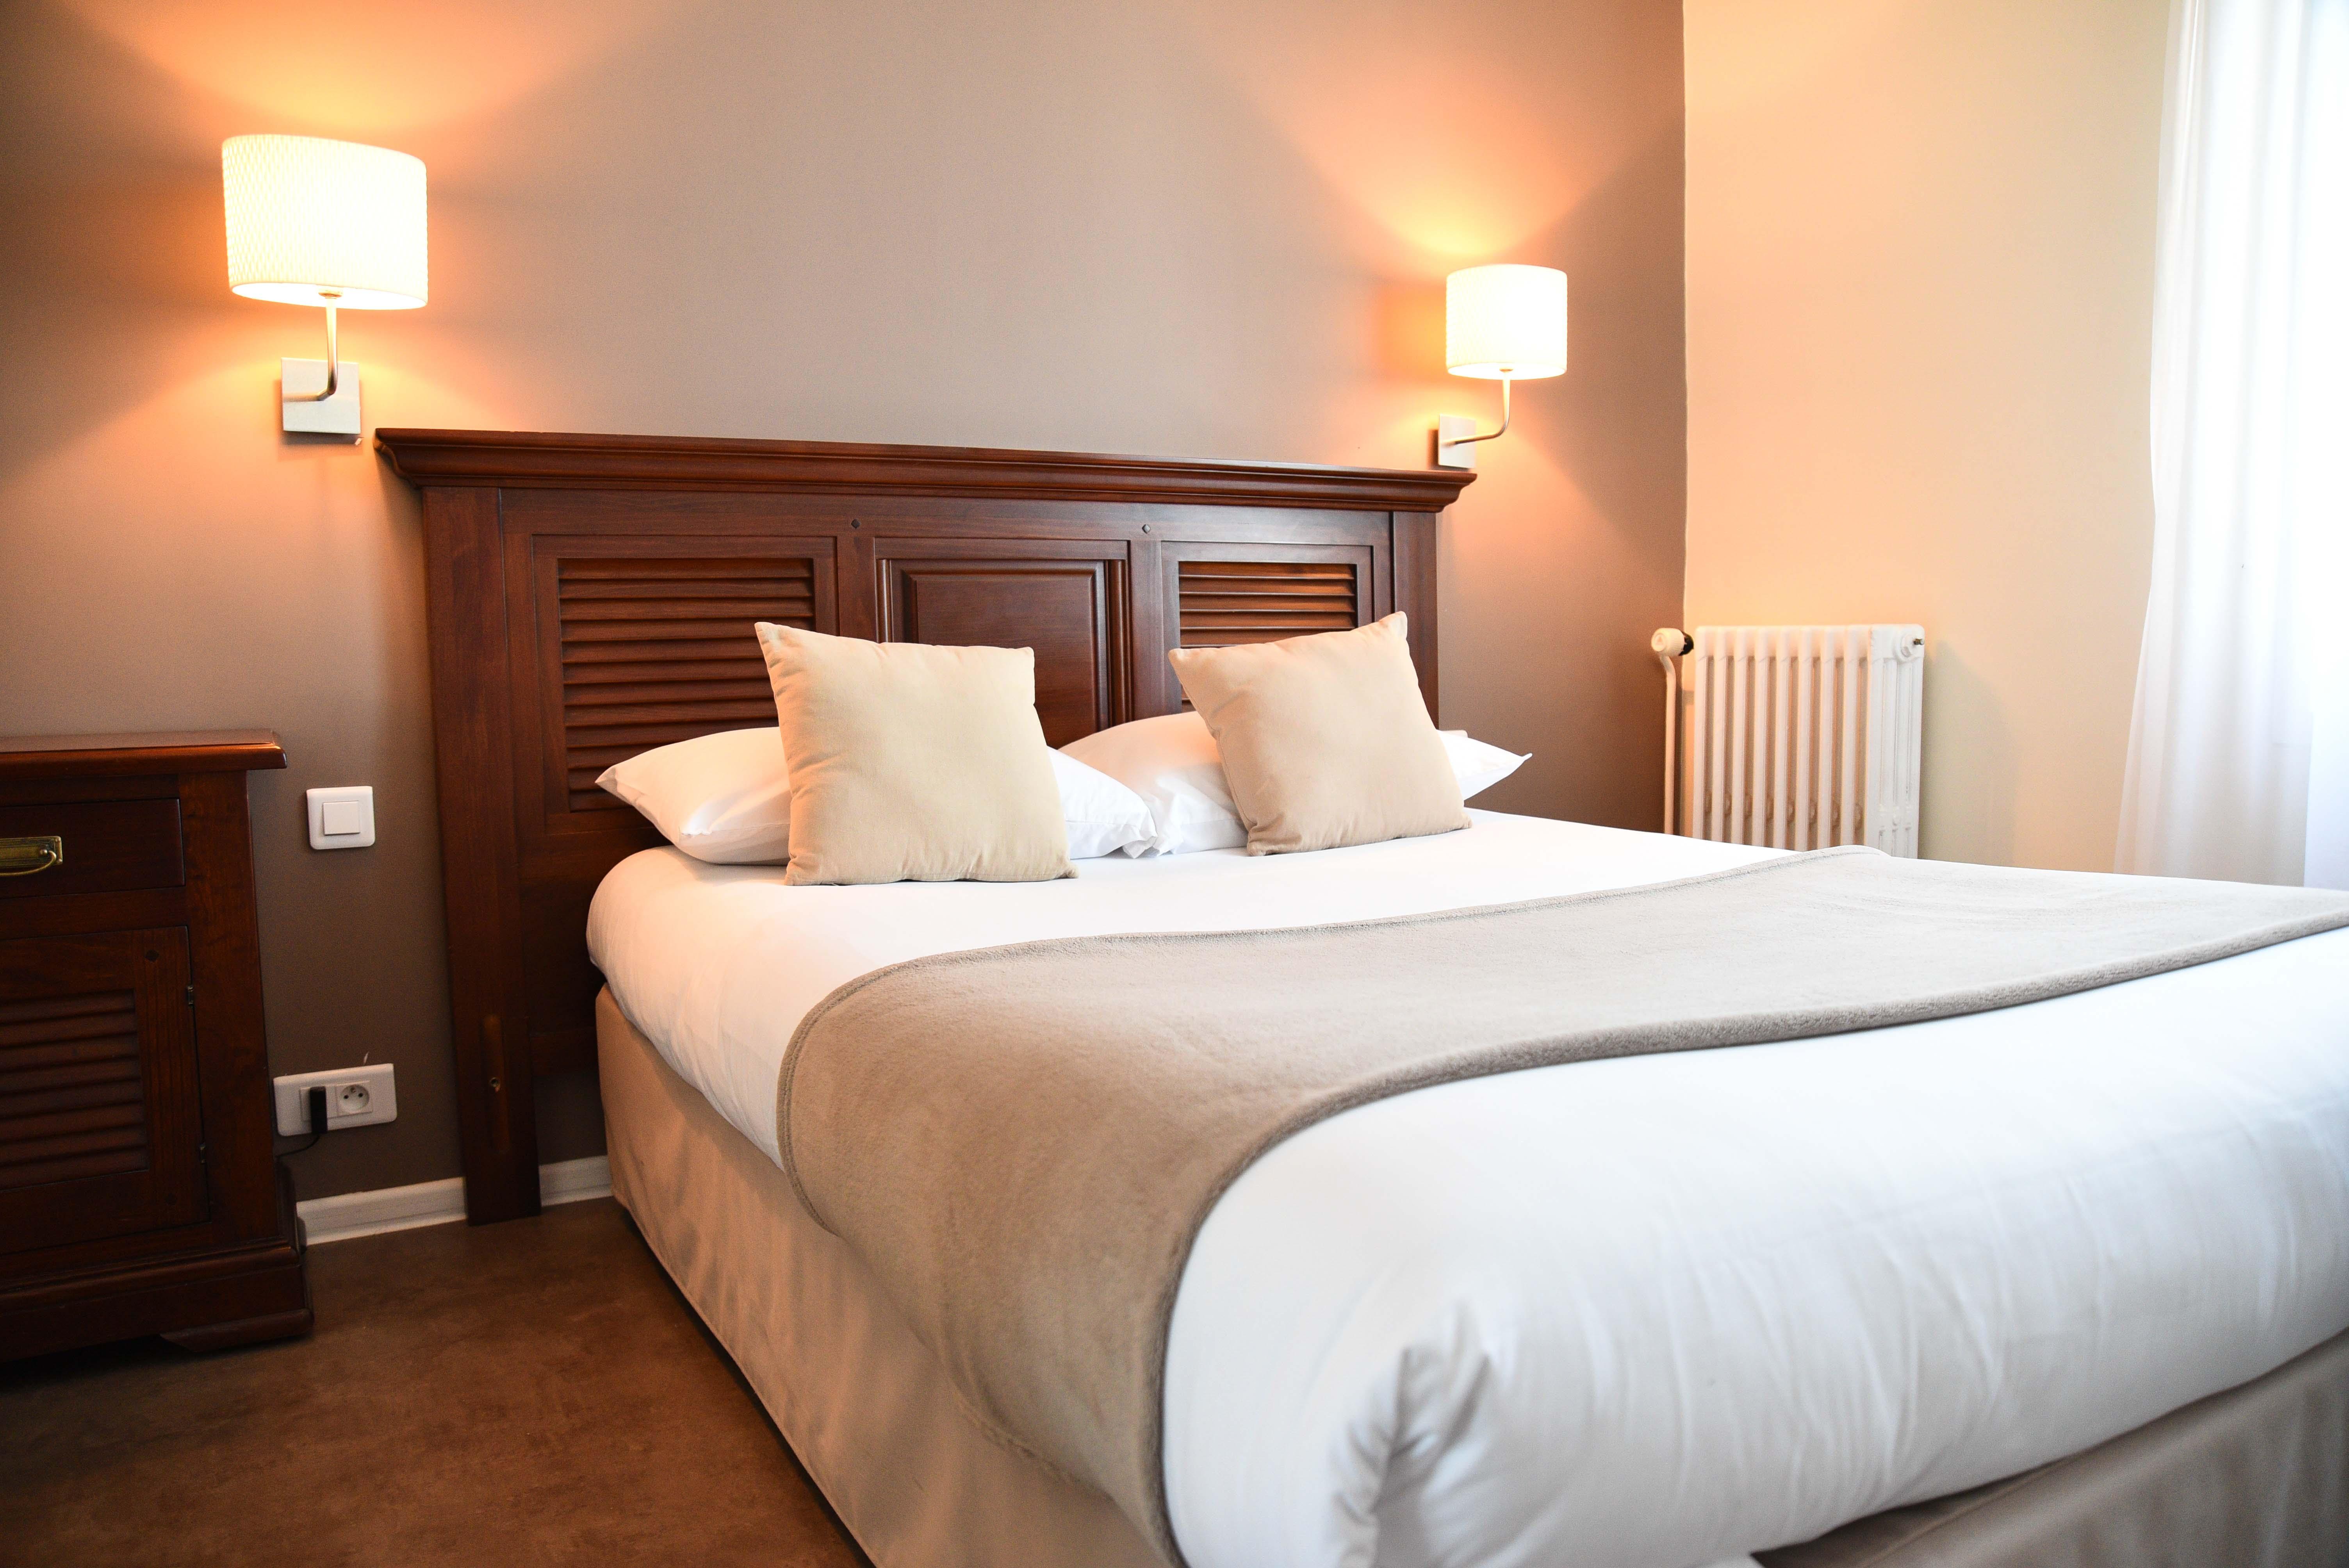 lit-chambre-hotel